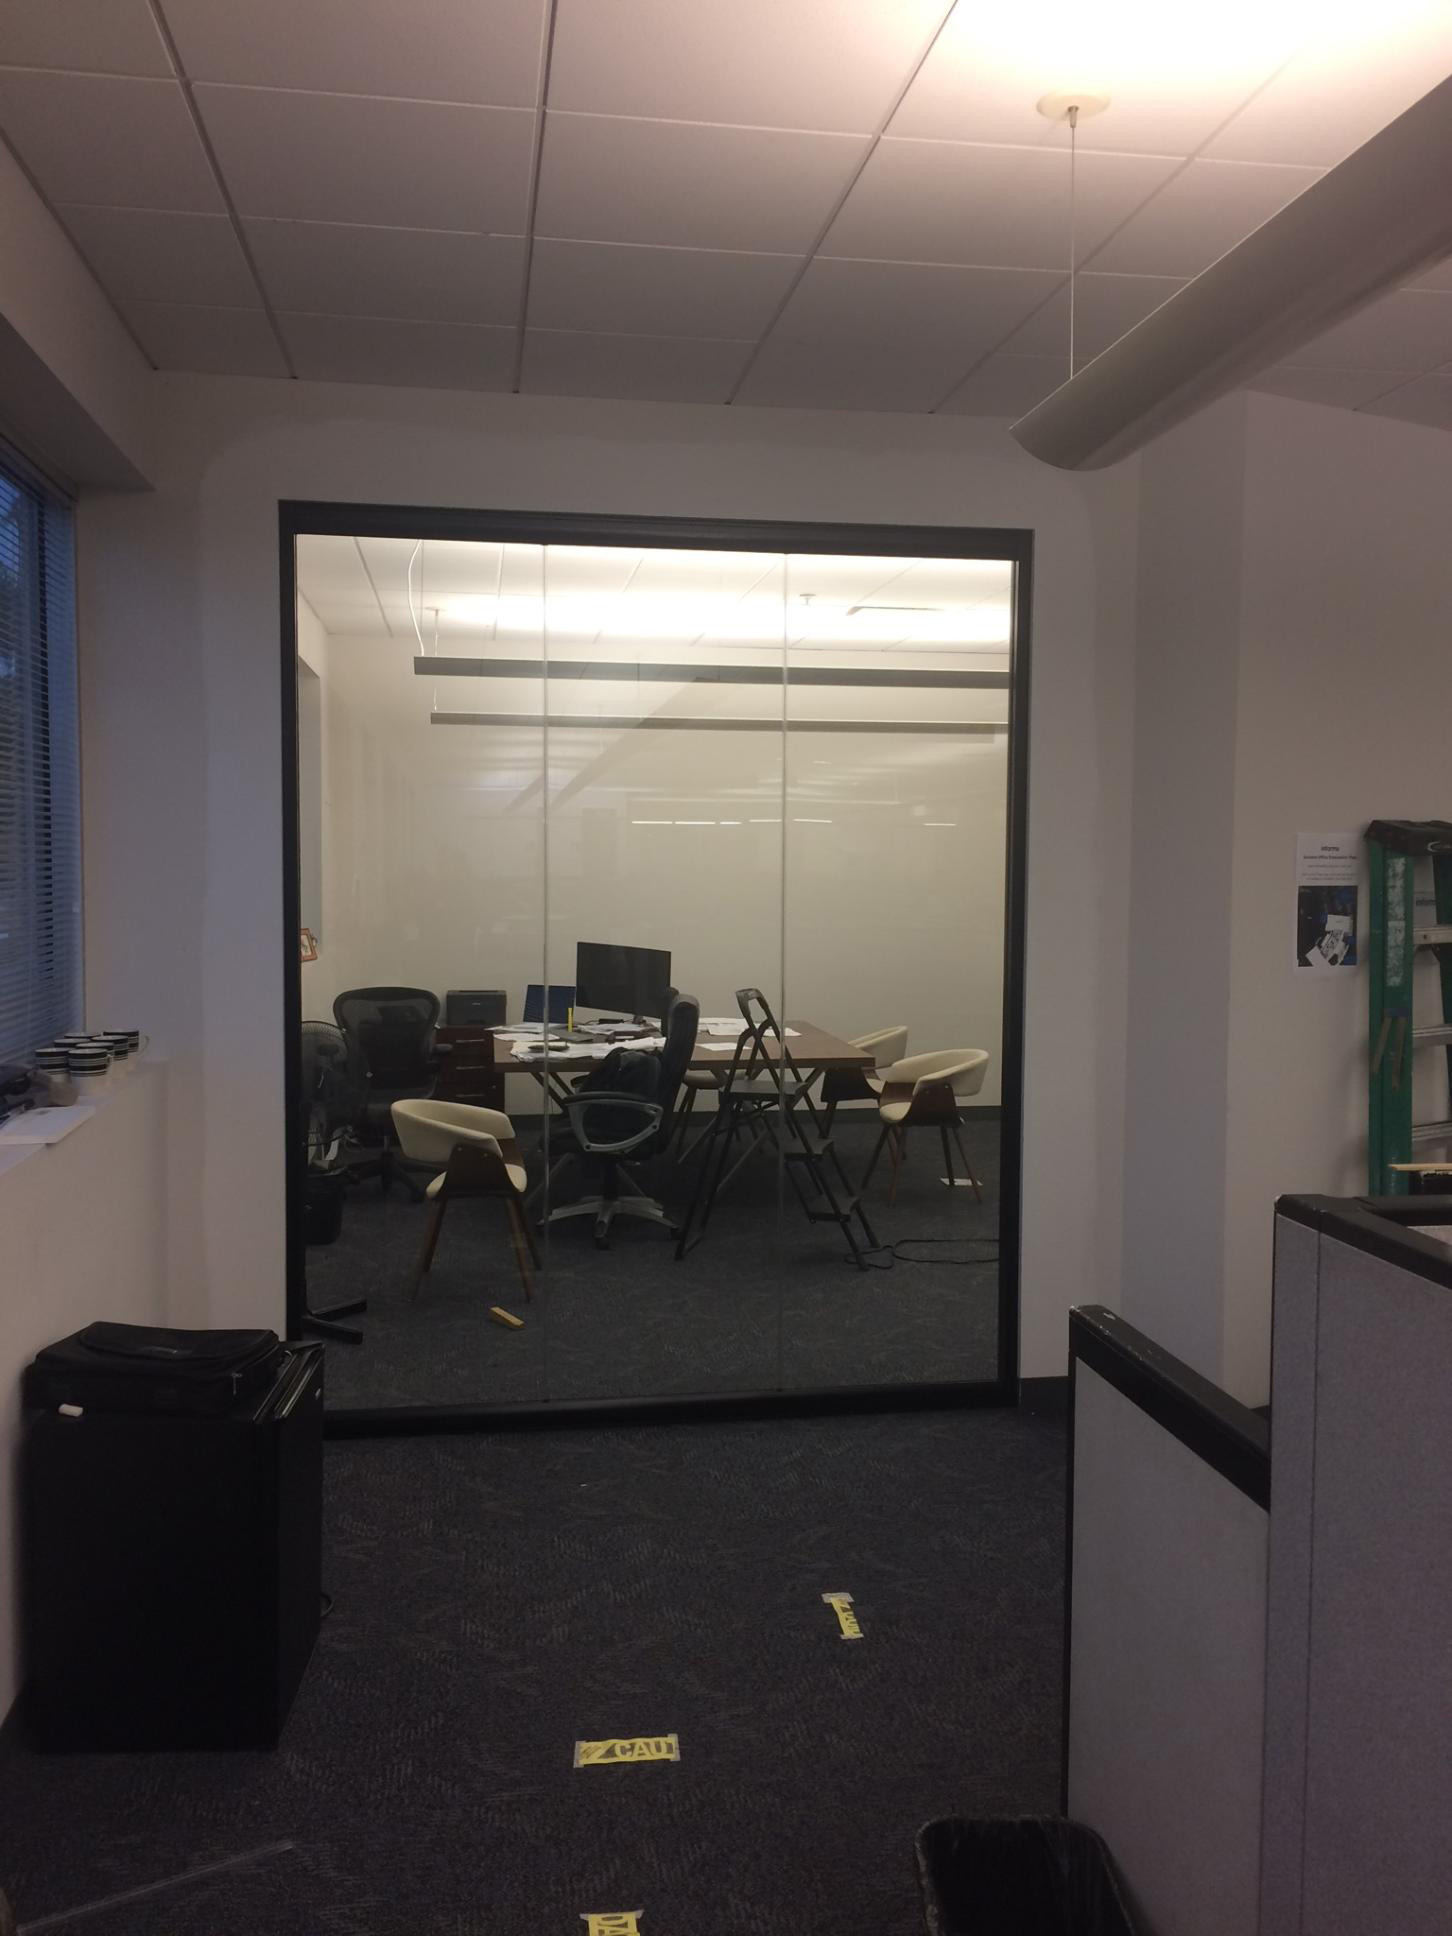 manasota-office-supplies-llc-img-6015-2-.jpg